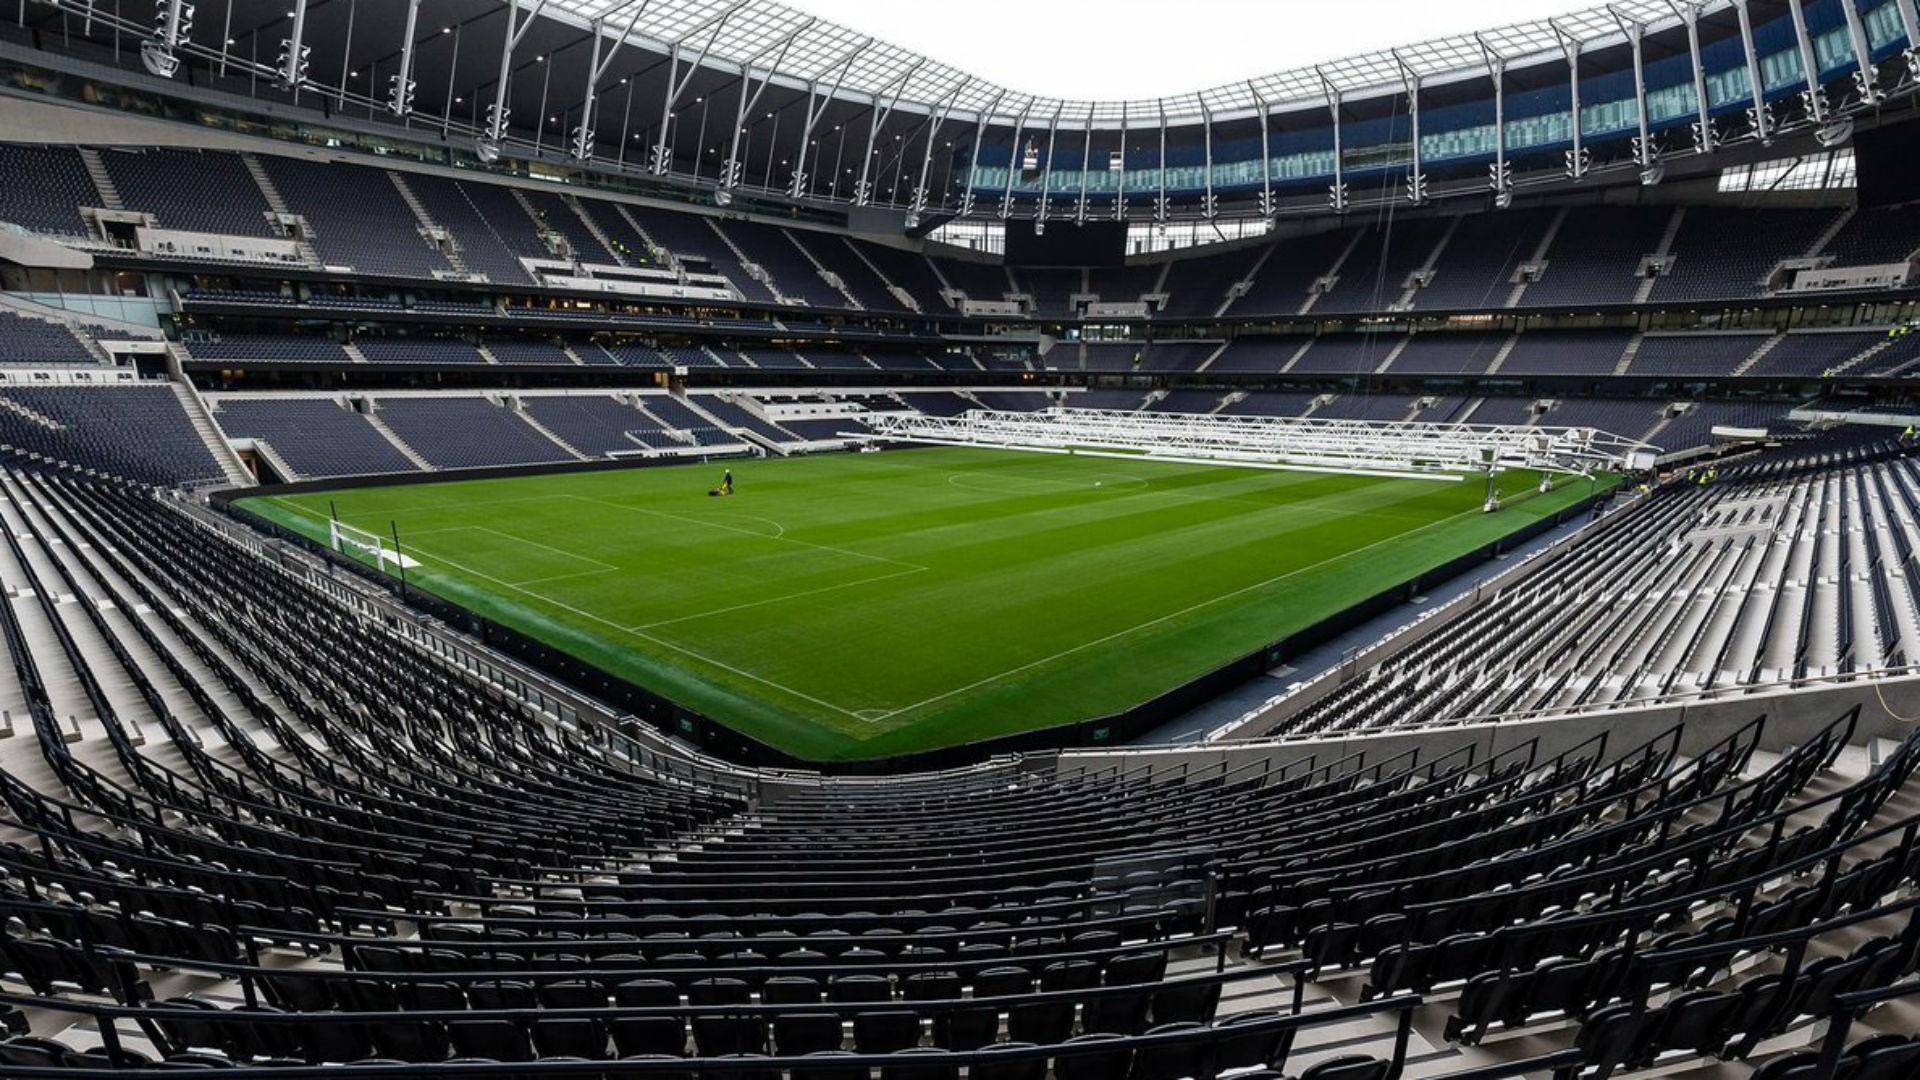 LOOK: Inside Tottenham's new stadium ahead of grand opening